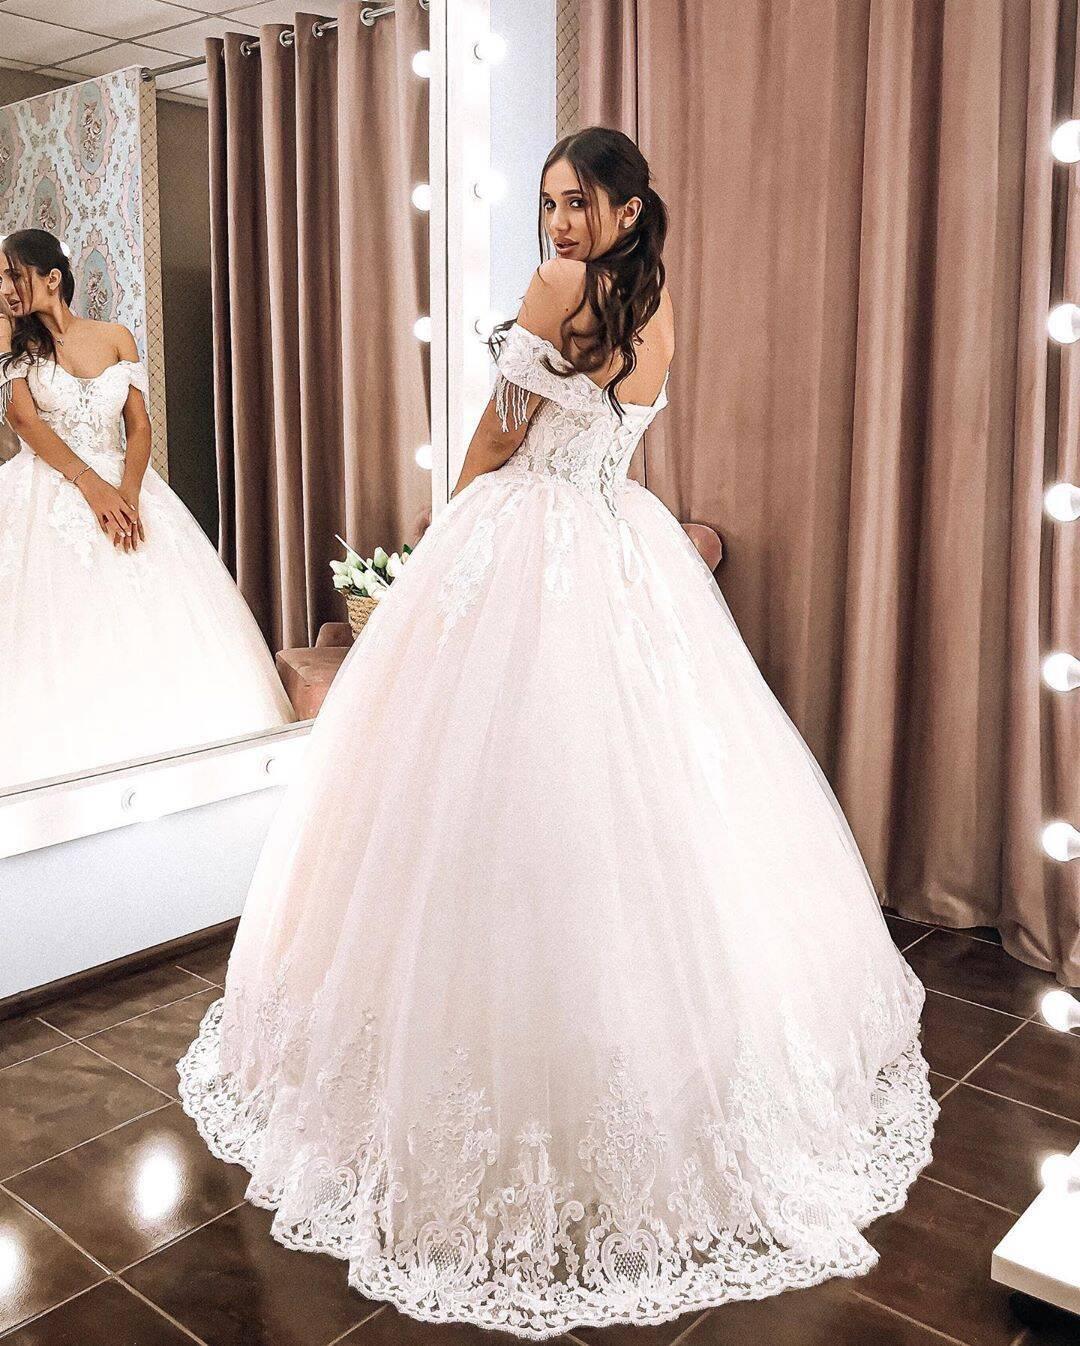 Даша Ульянова приміряла весільну сукню